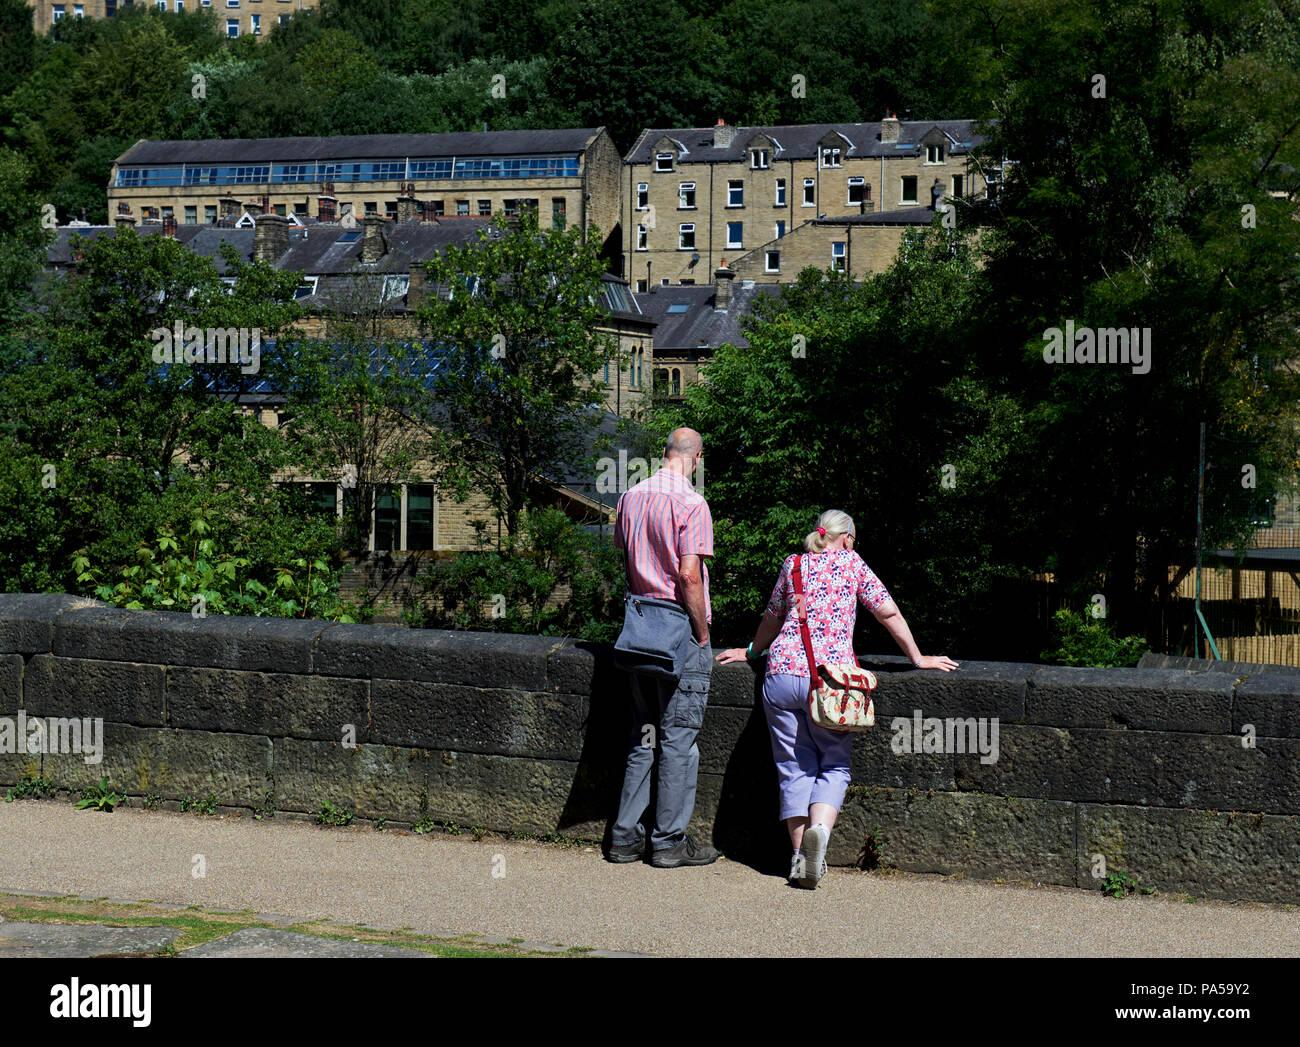 Couple on canal towpath, looking over bridge, Hebden Bridge, Calderdale, West Yorkshire, England UK - Stock Image